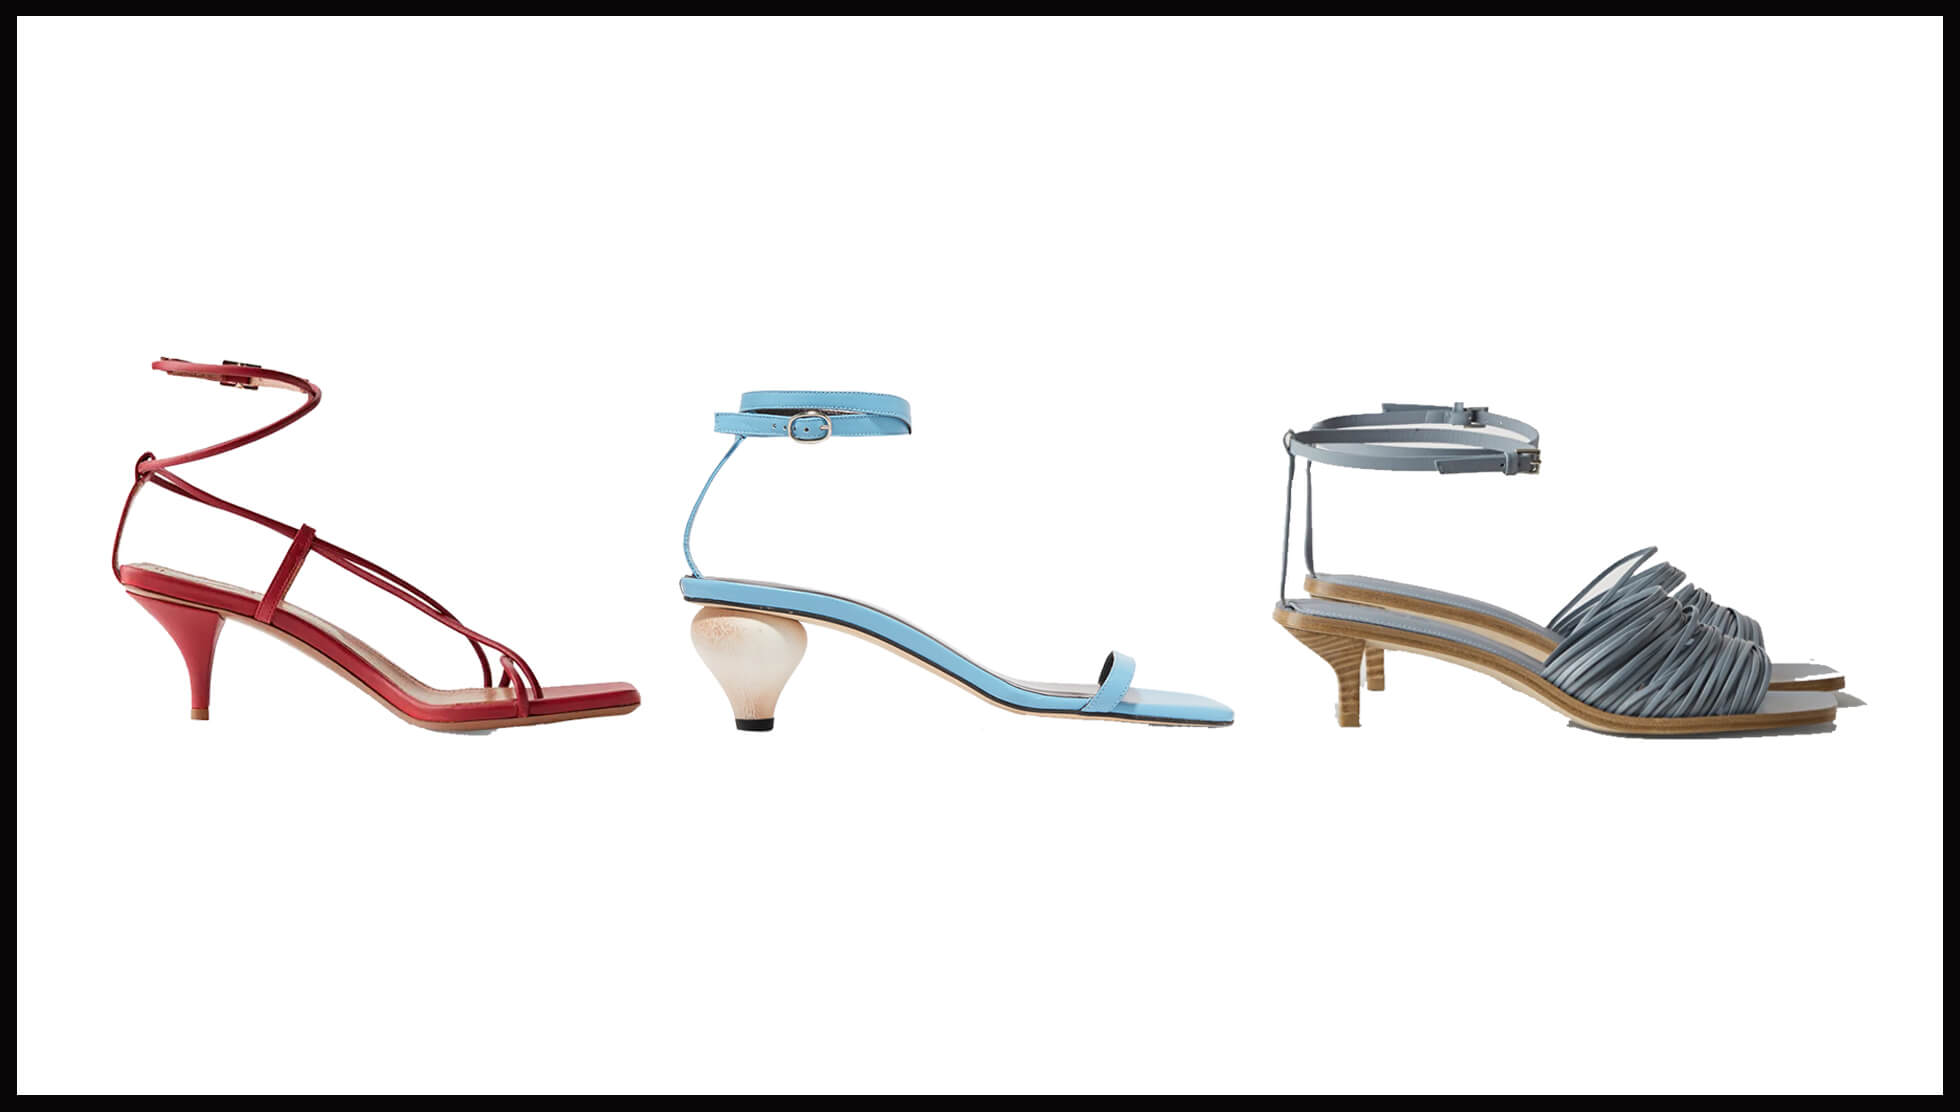 sandalersnörning